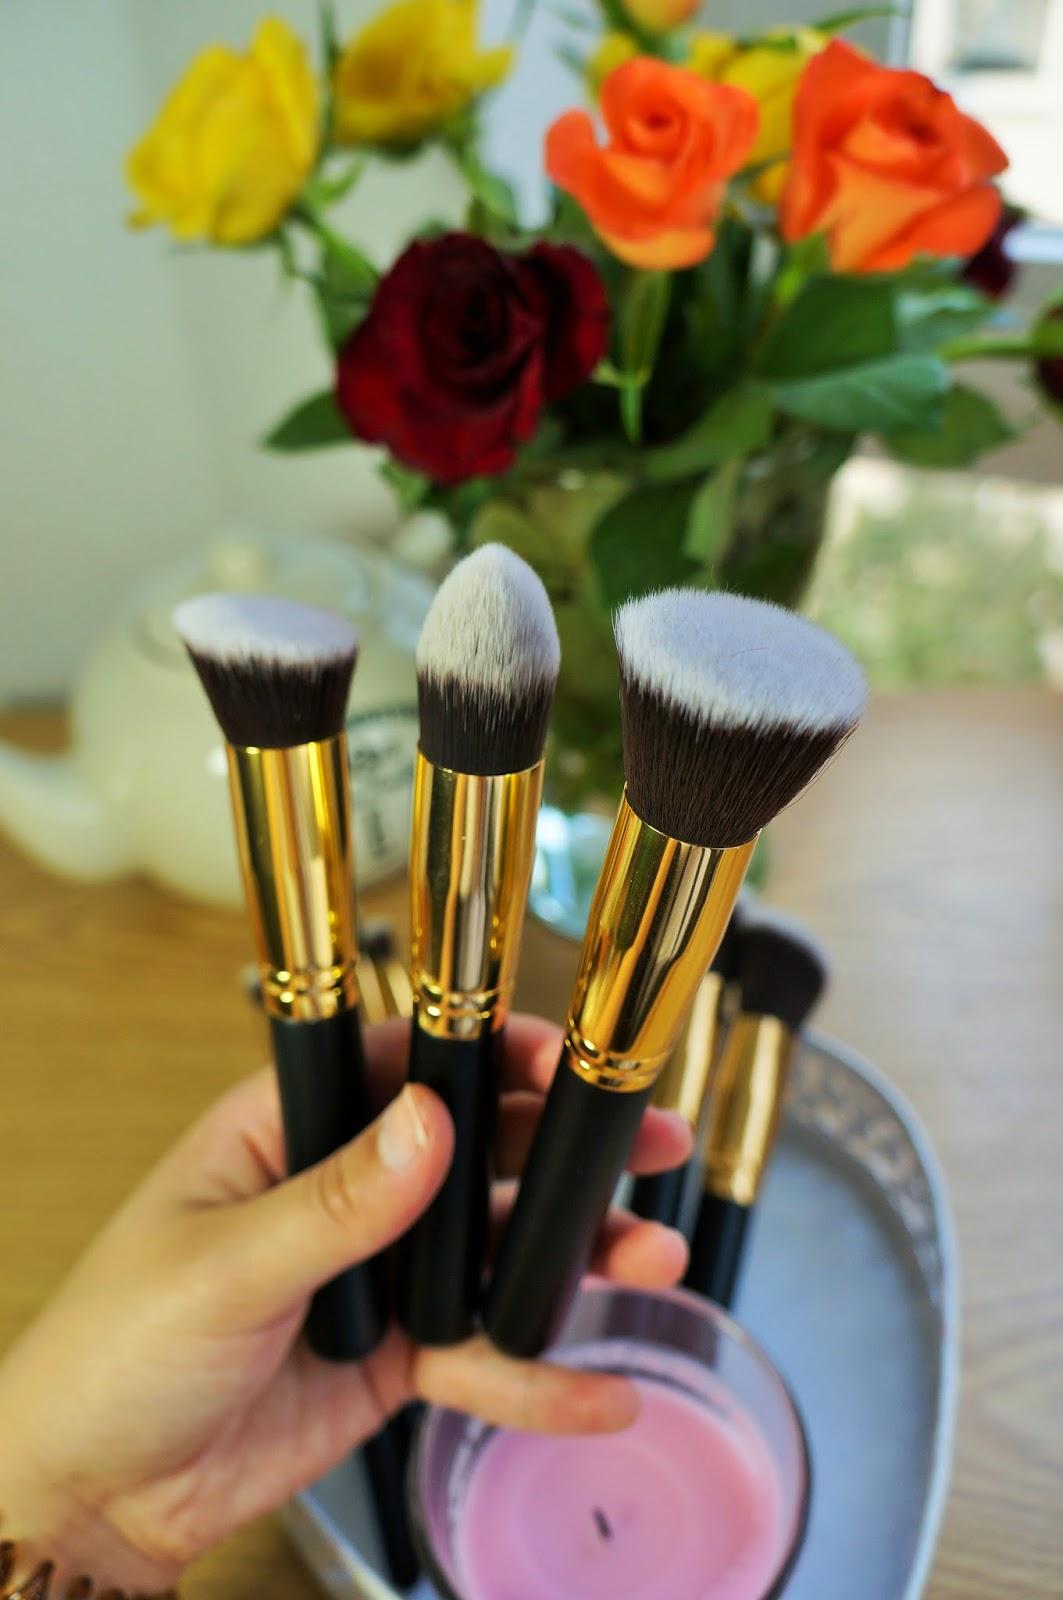 772d541f4c923 BH Cosmetics Sculpt   Blend Pinselset    Review + Daniel Wellington ...